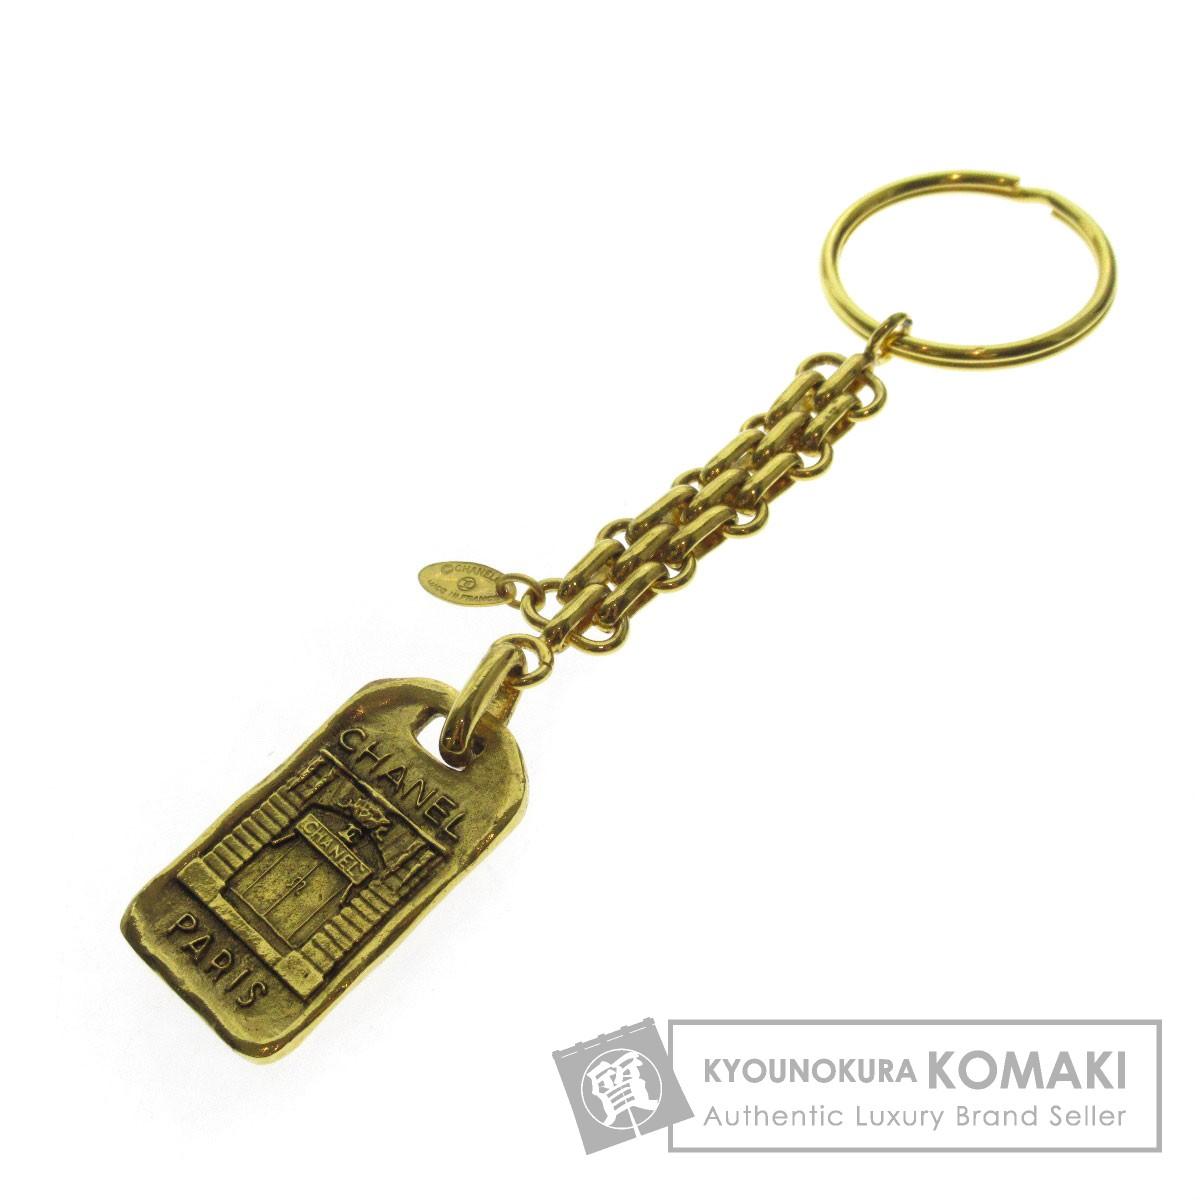 CHANEL ロゴデザイン キーホルダー 金属製 レディース 【中古】【シャネル】